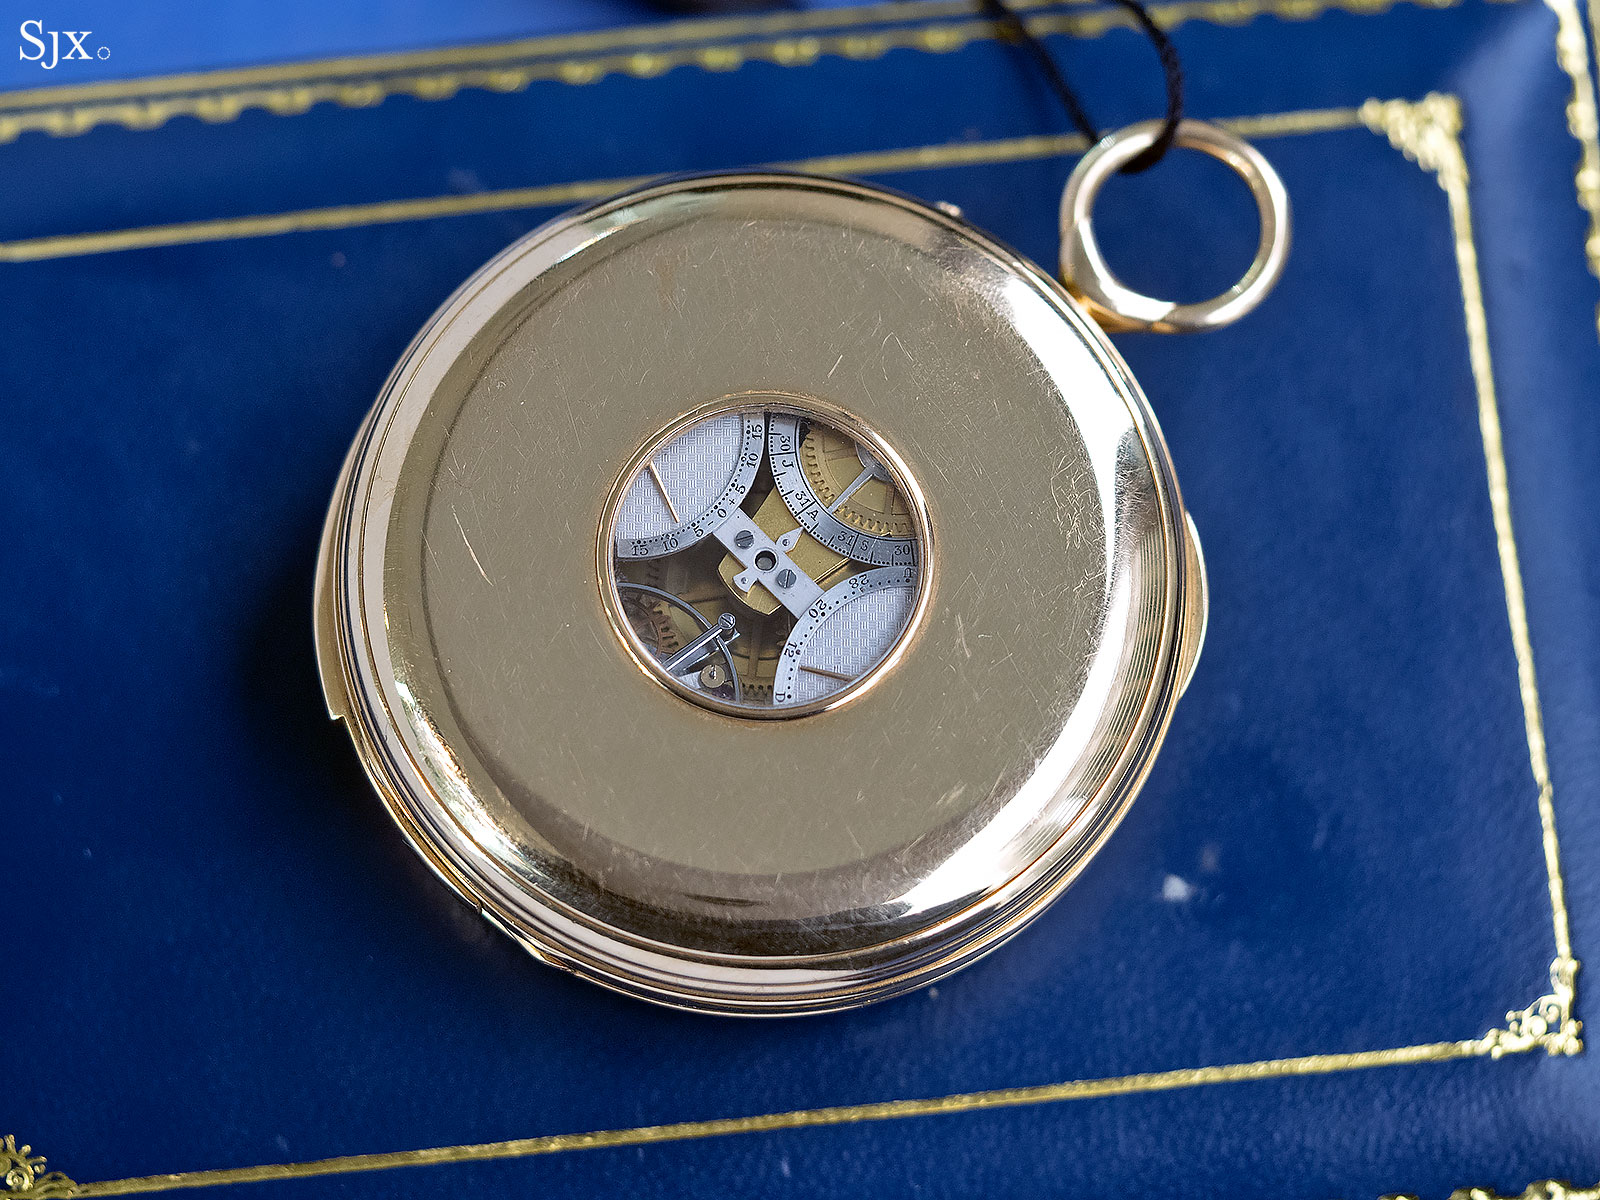 George Daniels Grand Complication pocket watch 23